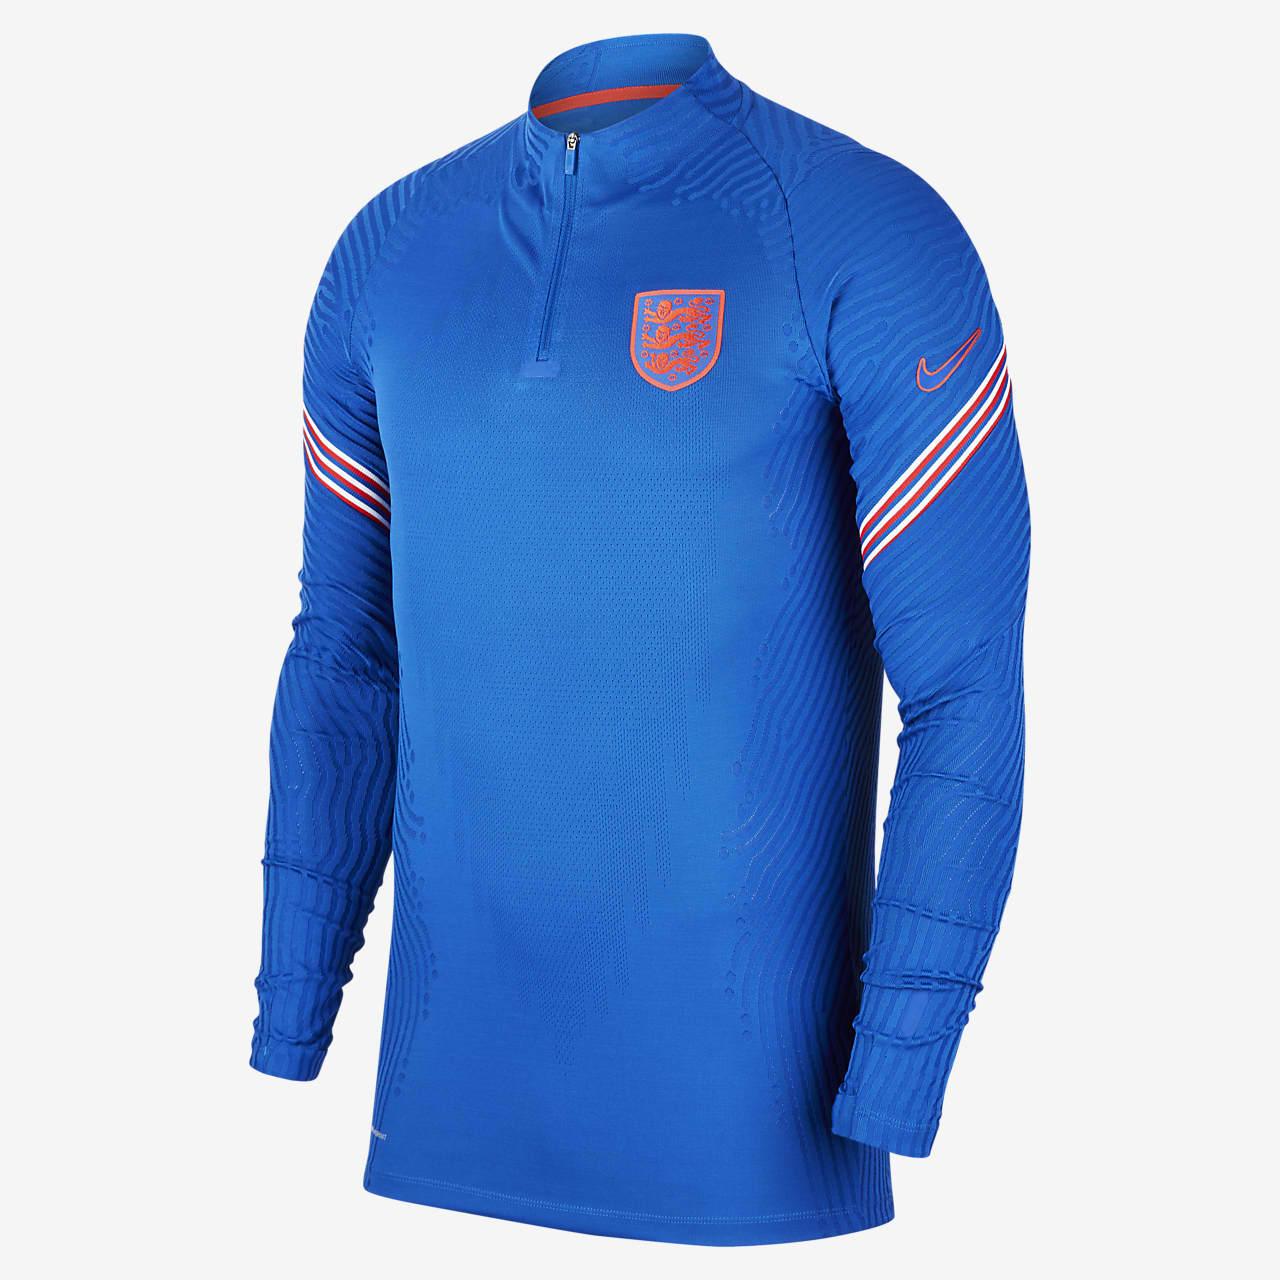 Męska treningowa koszulka piłkarska Nike VaporKnit Anglia Strike